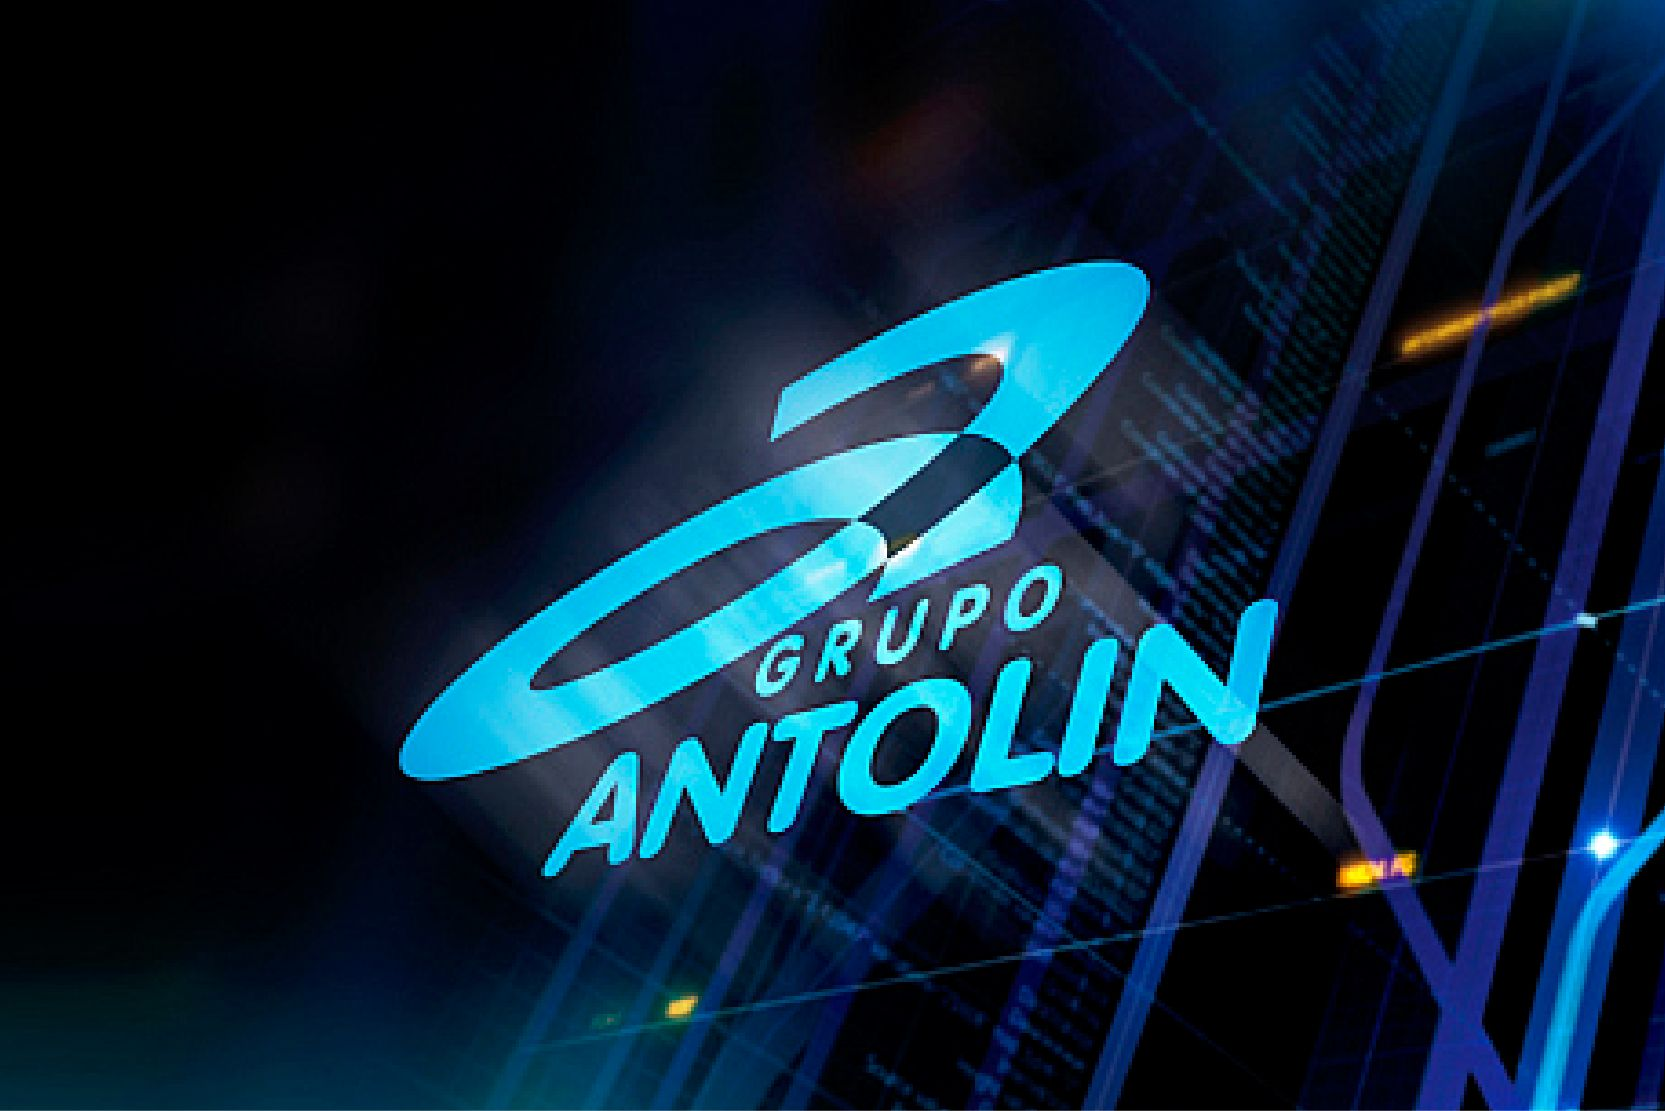 Logo de Grupo Antolín.